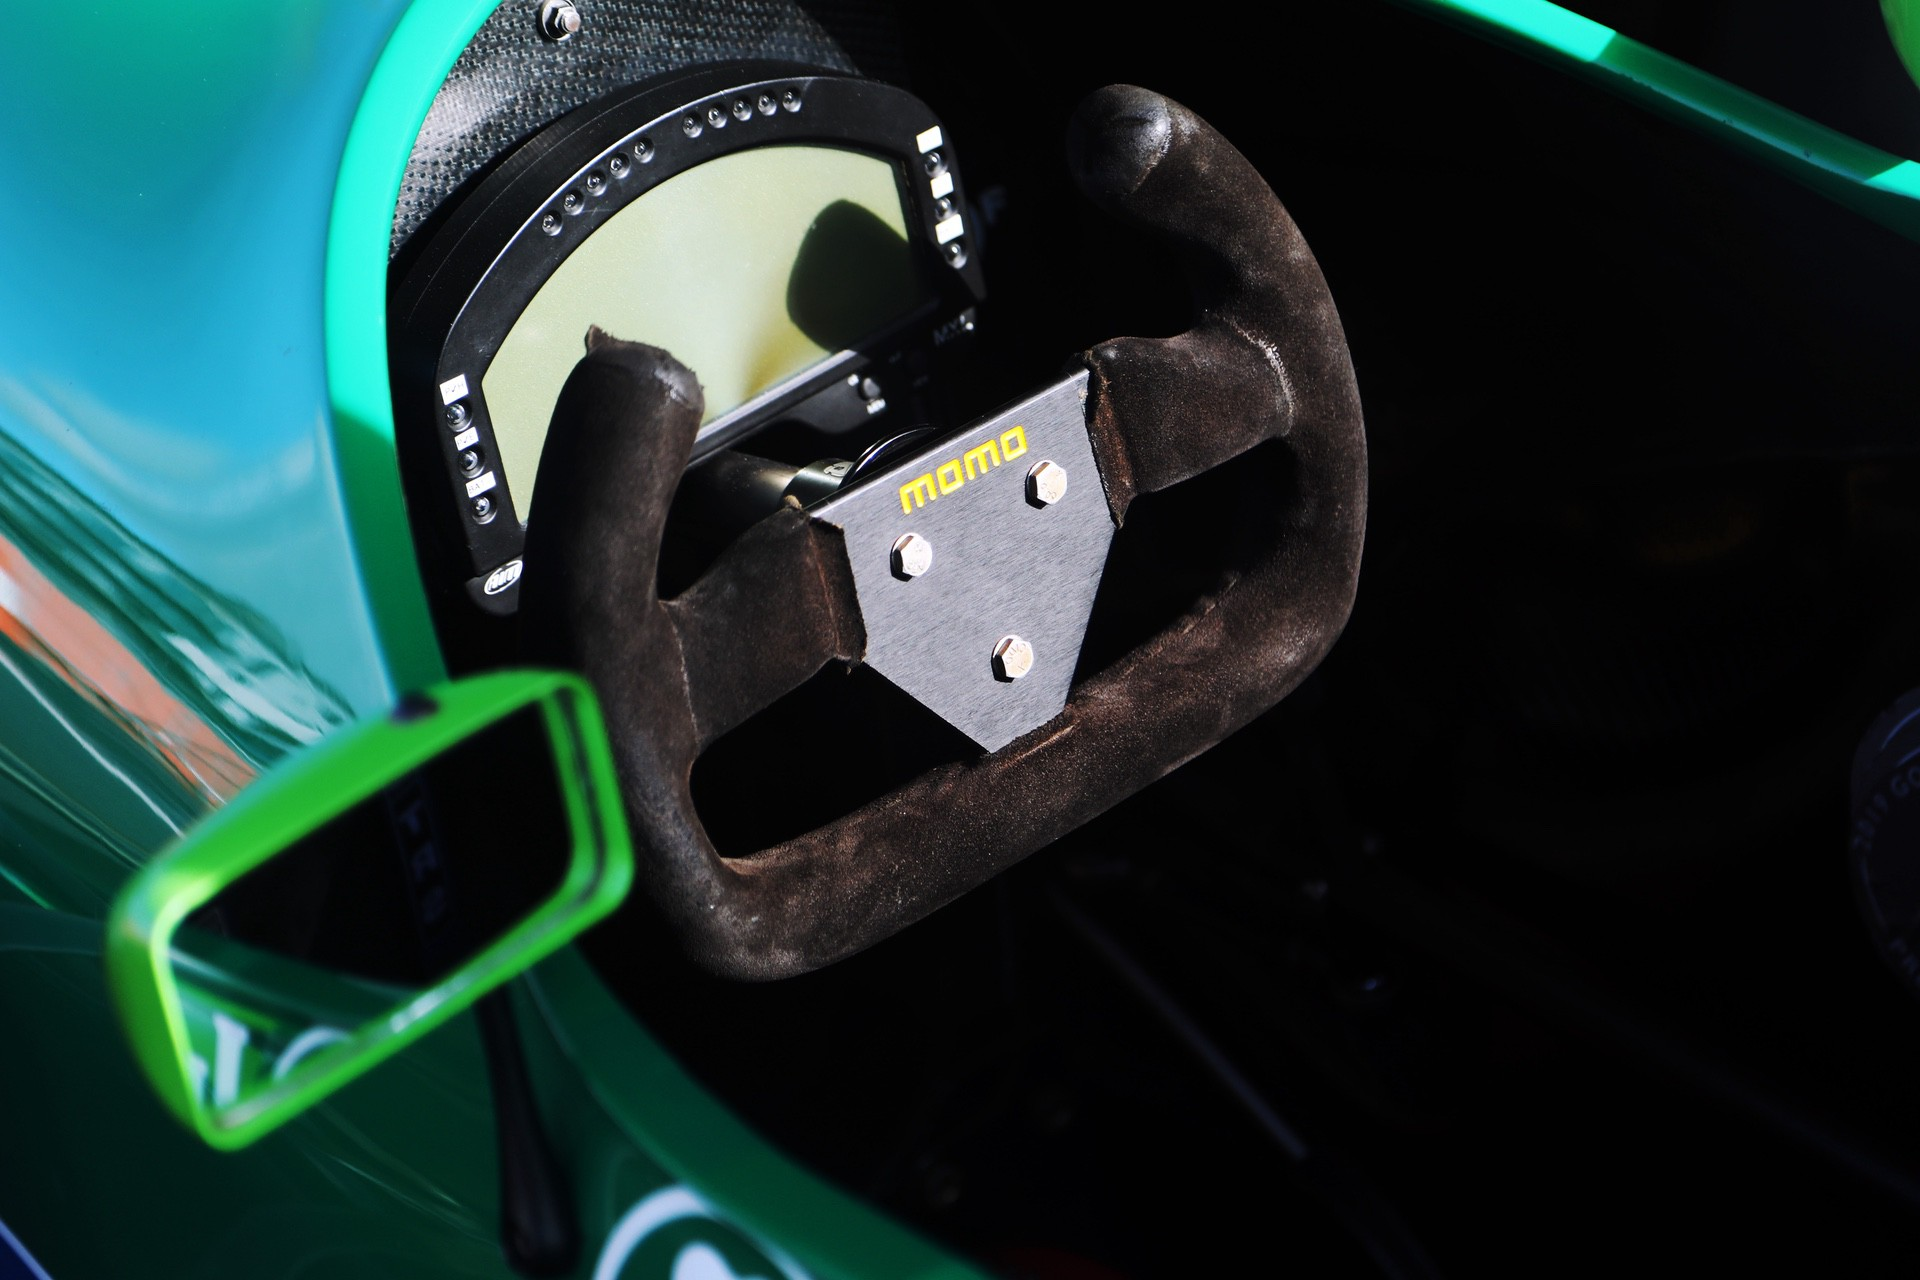 Michael_Schumacher_Jordan_F1_debut-0000